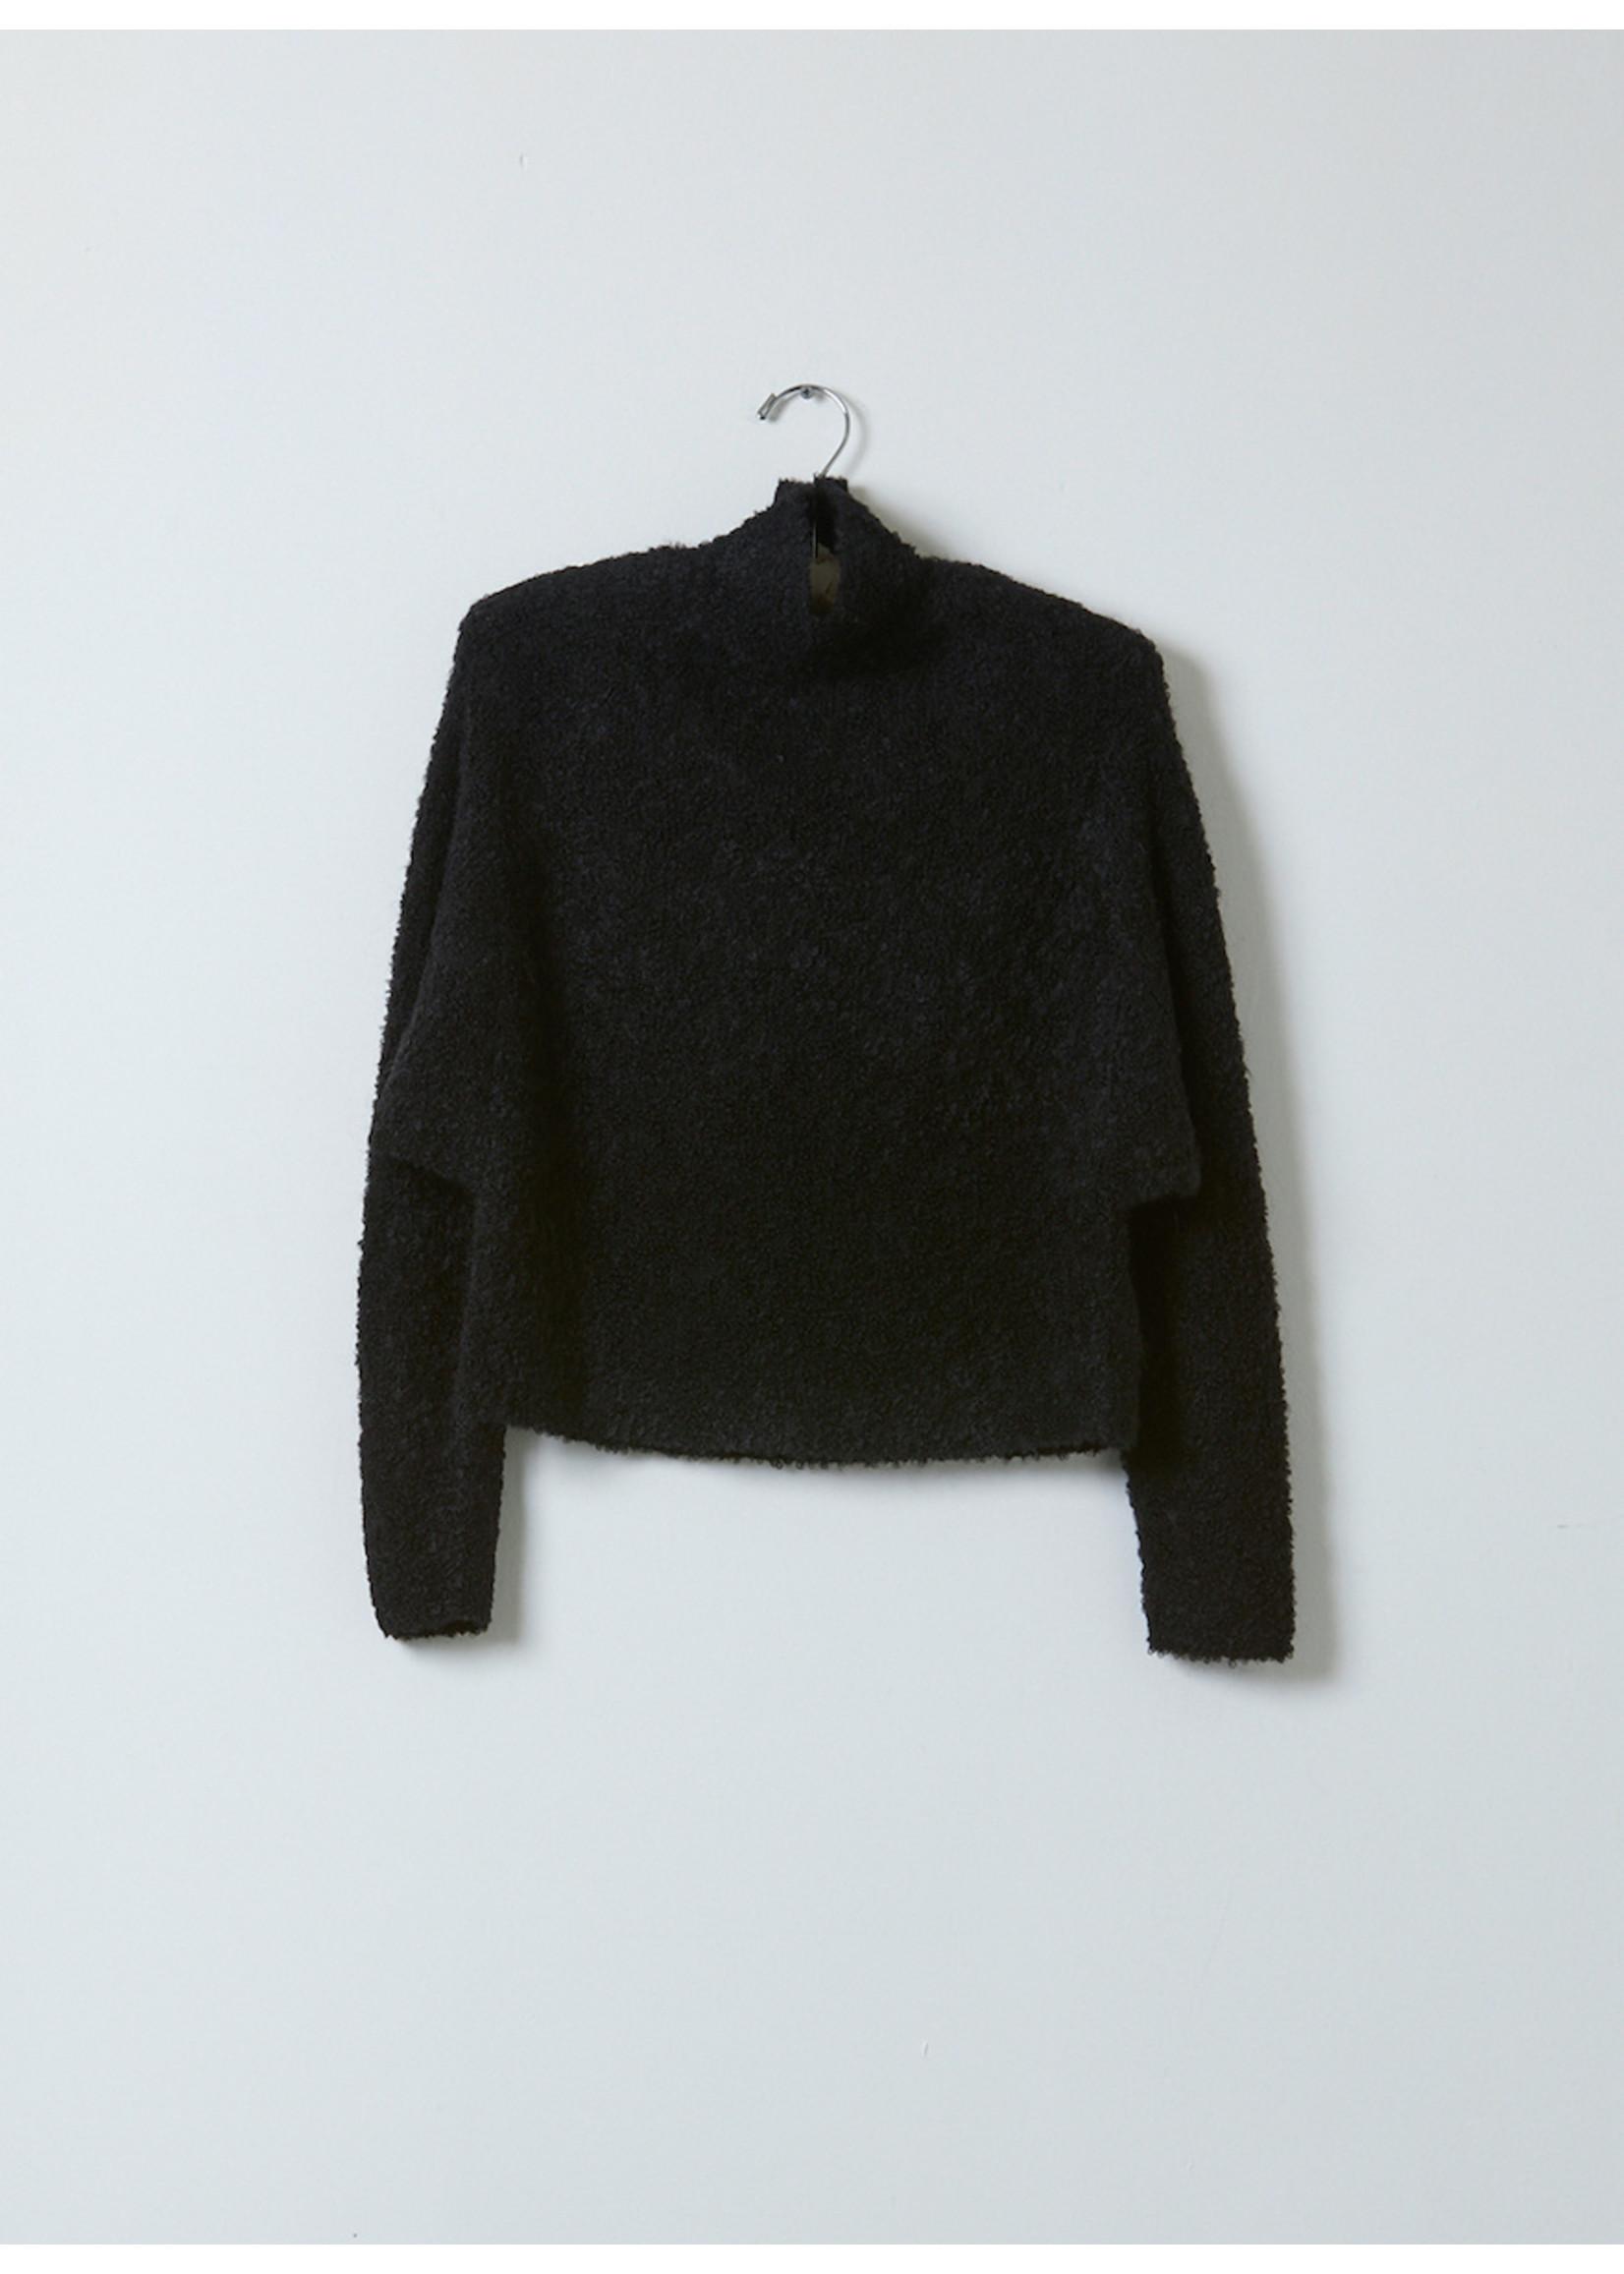 Atelier Delphine Savannah Sweaters